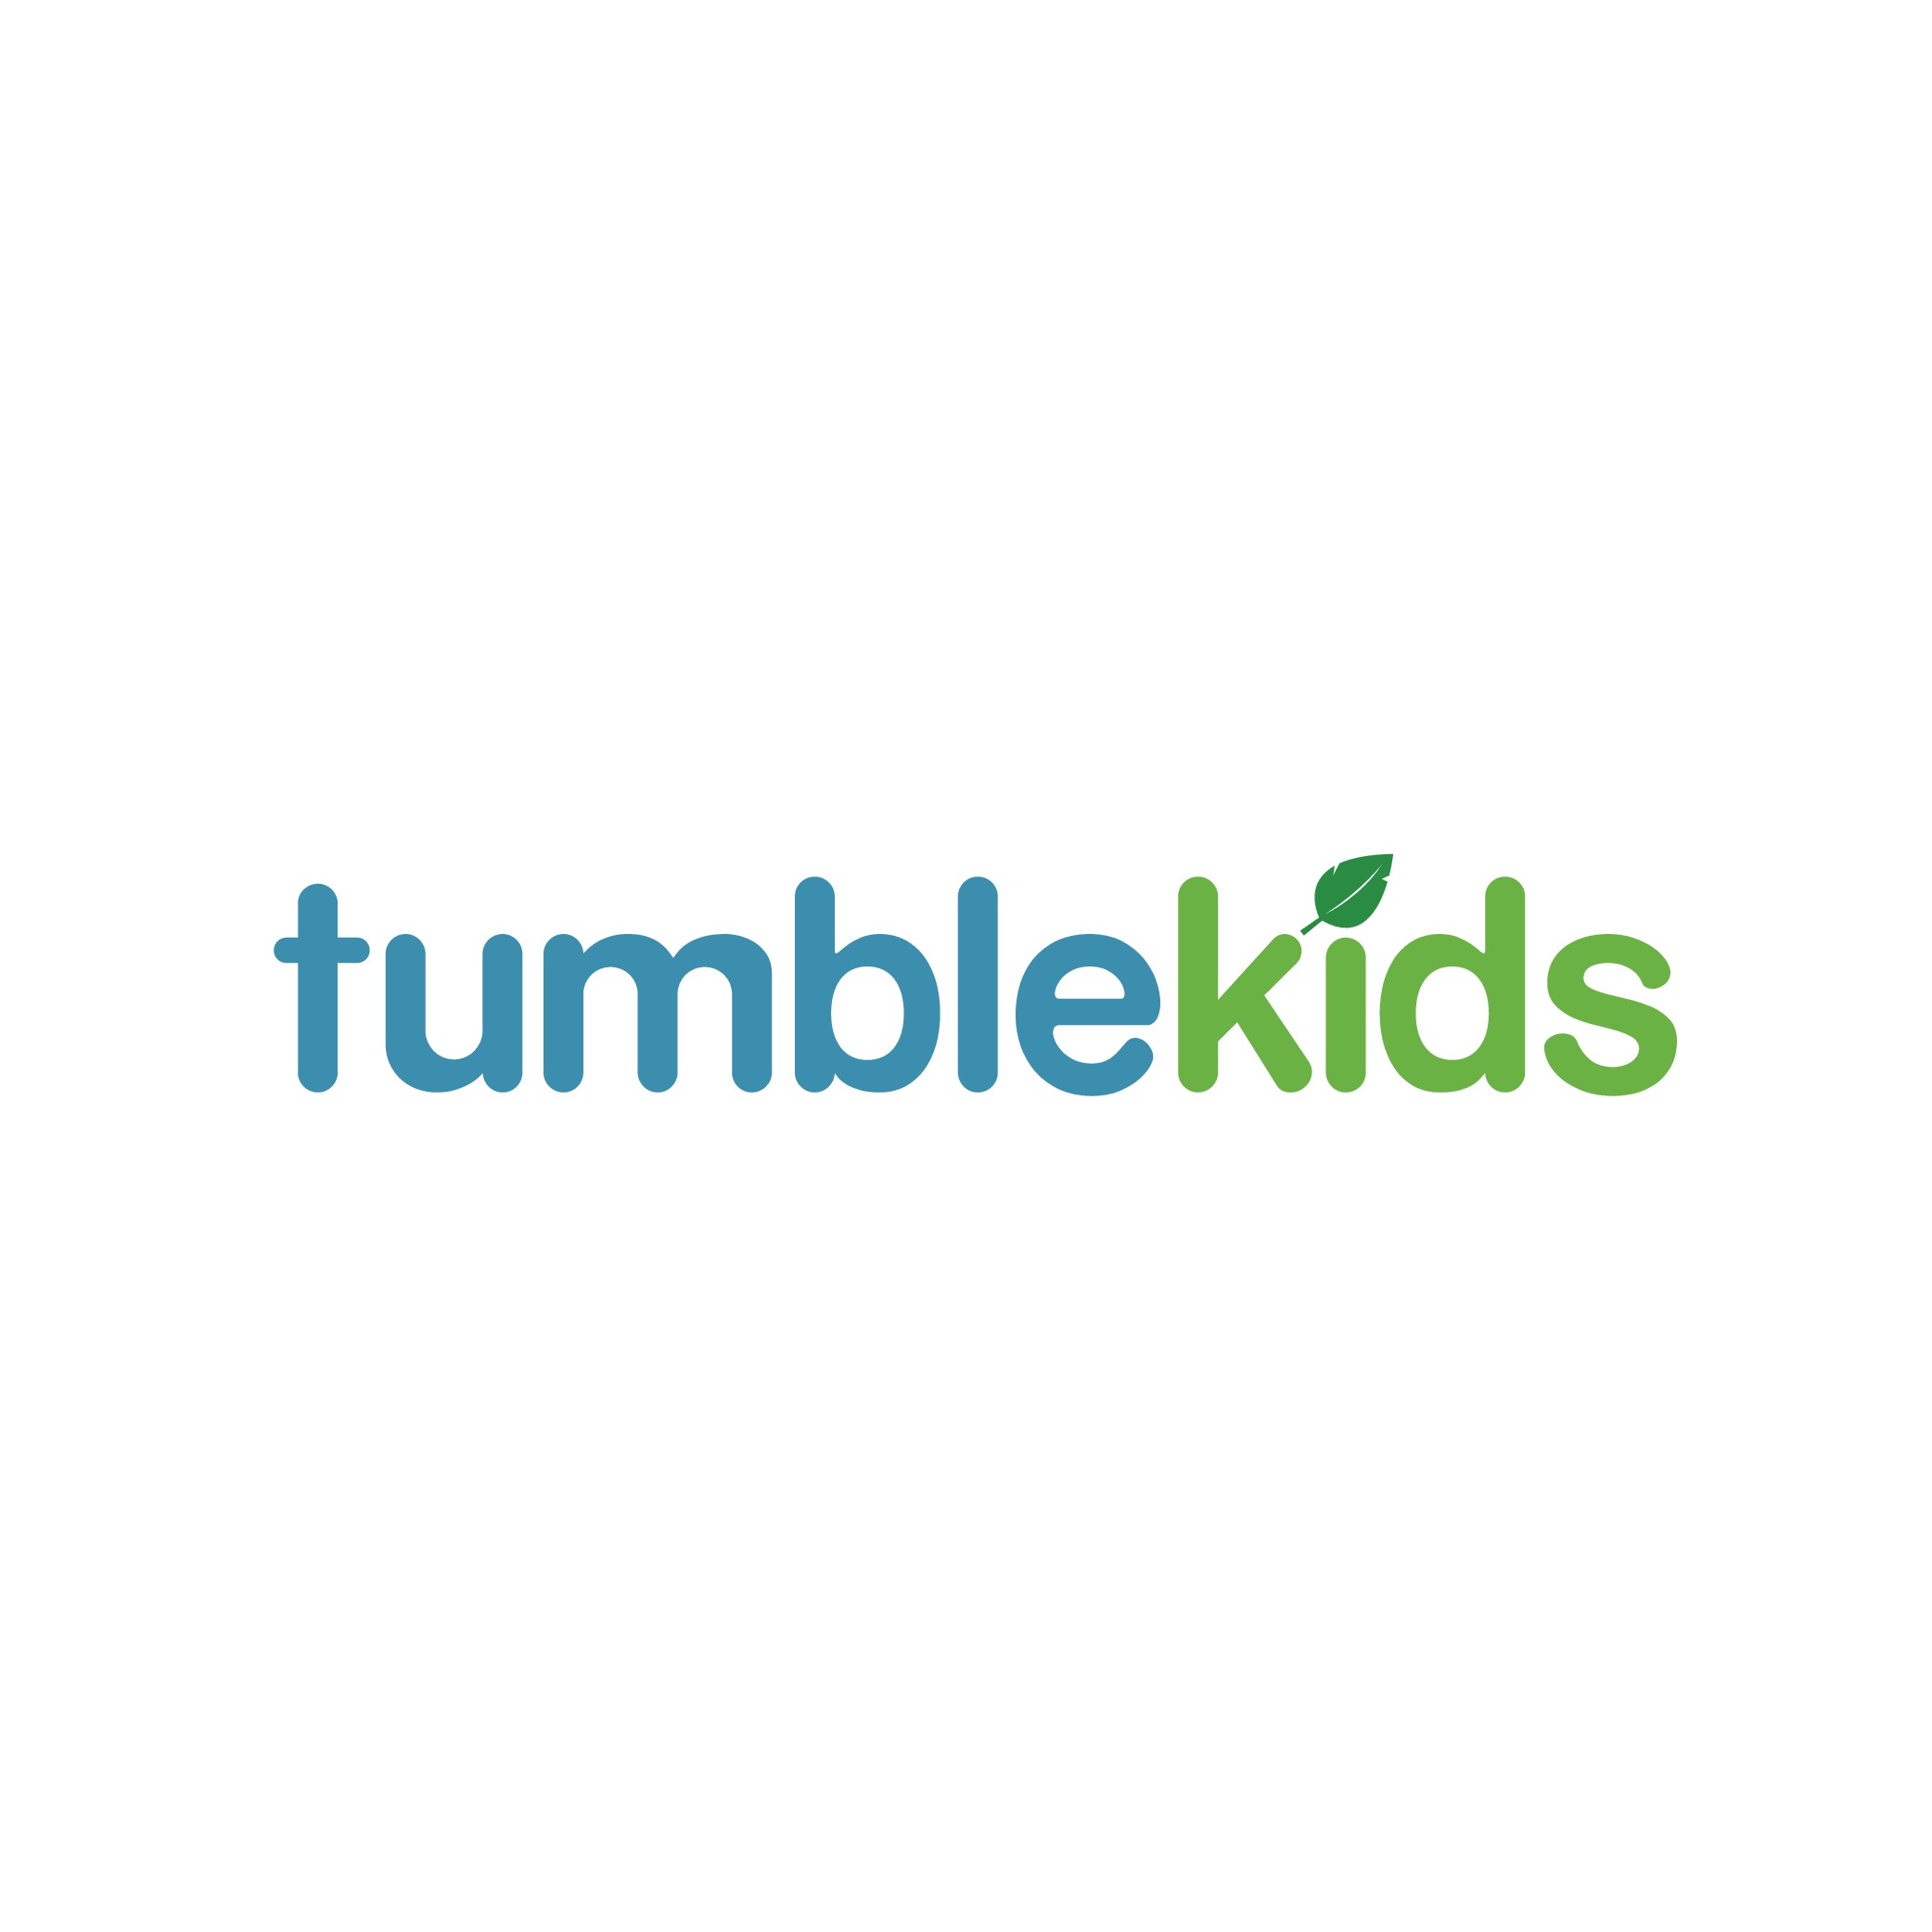 Design a playful logo for a startup children's clothing line